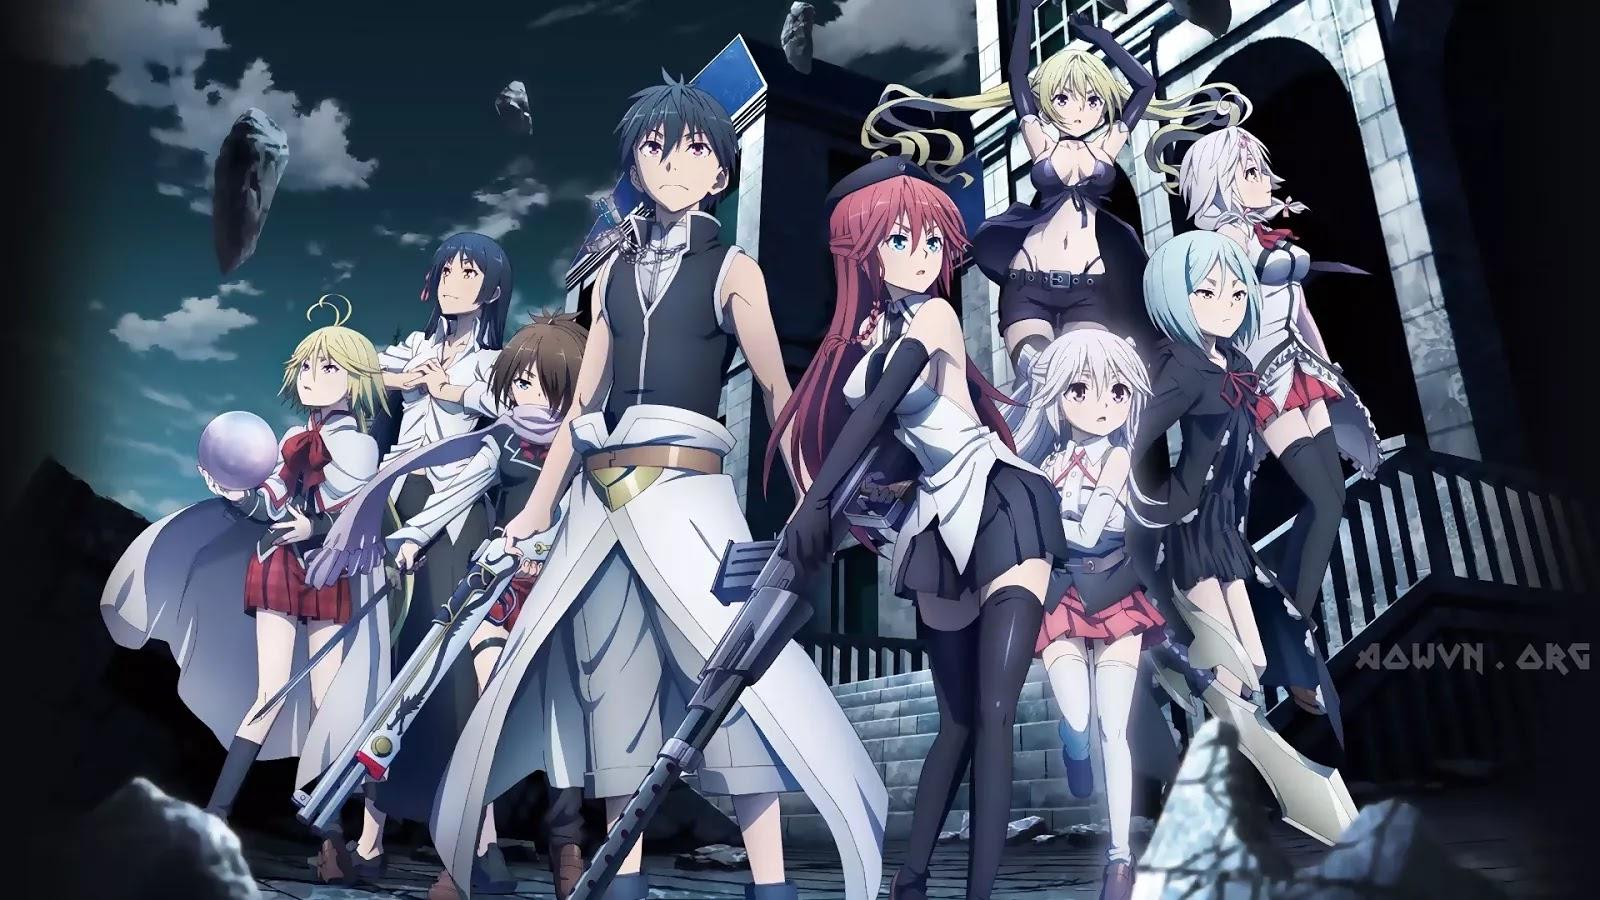 AowVN.org min%2B%25284%2529 - [ Anime 3pg Mp4 ] Trinity Seven BD + OVA | Vietsub